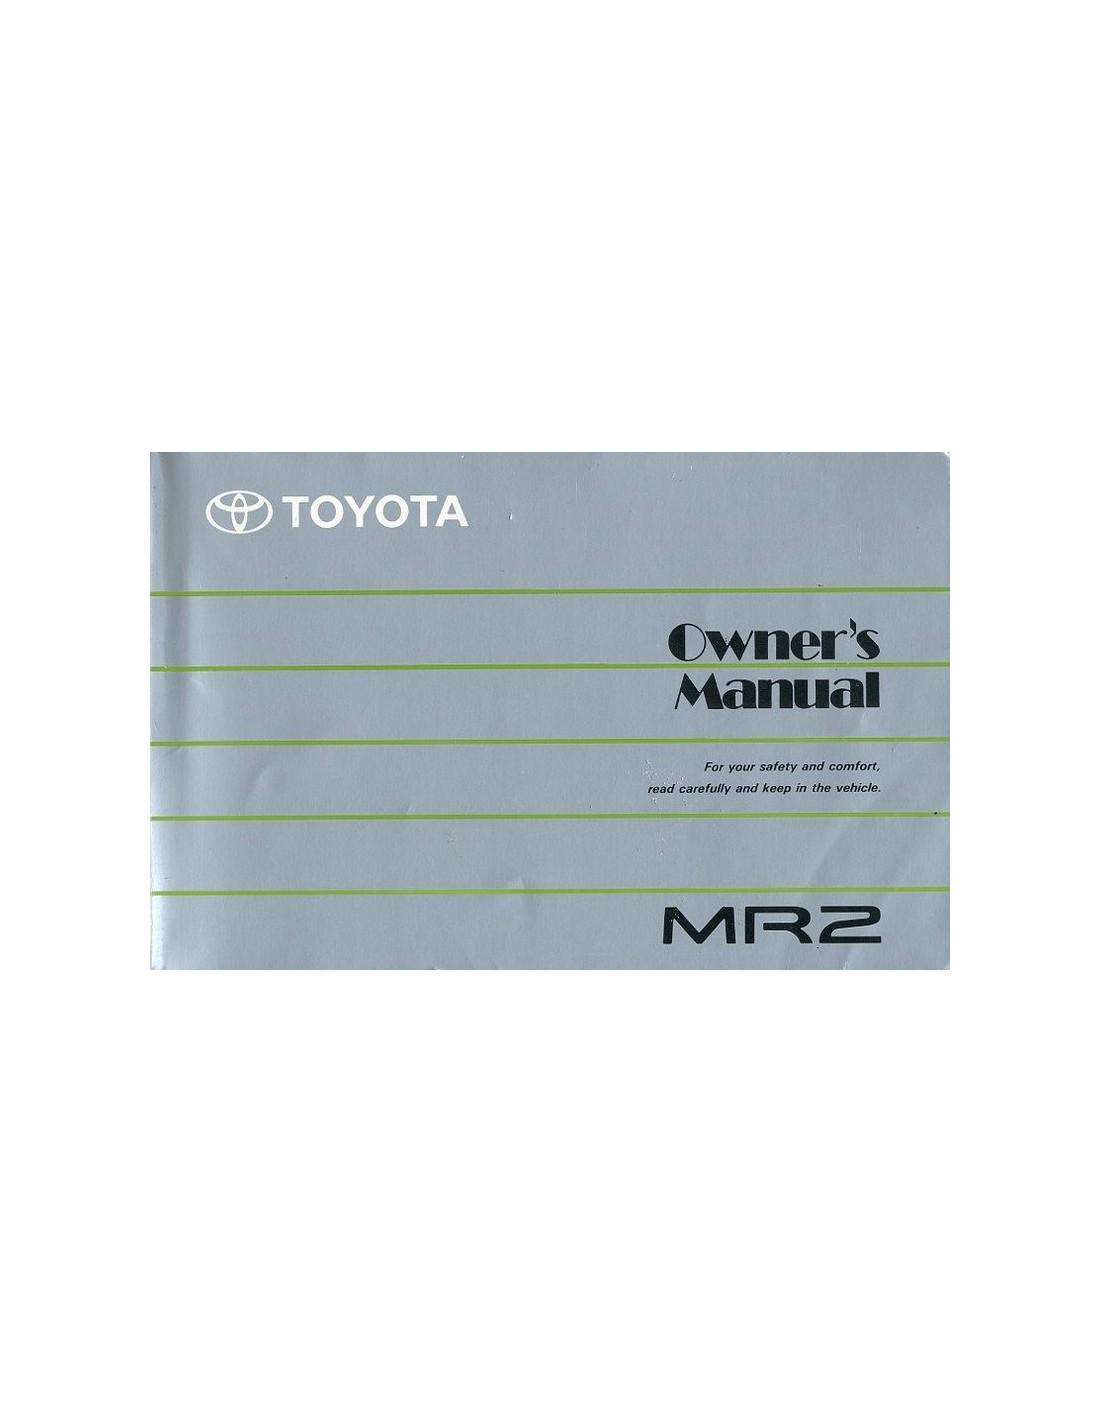 1989 toyota mr2 owner s manual english rh autolit eu 1991 toyota mr2 owners manual pdf toyota mr2 user manual